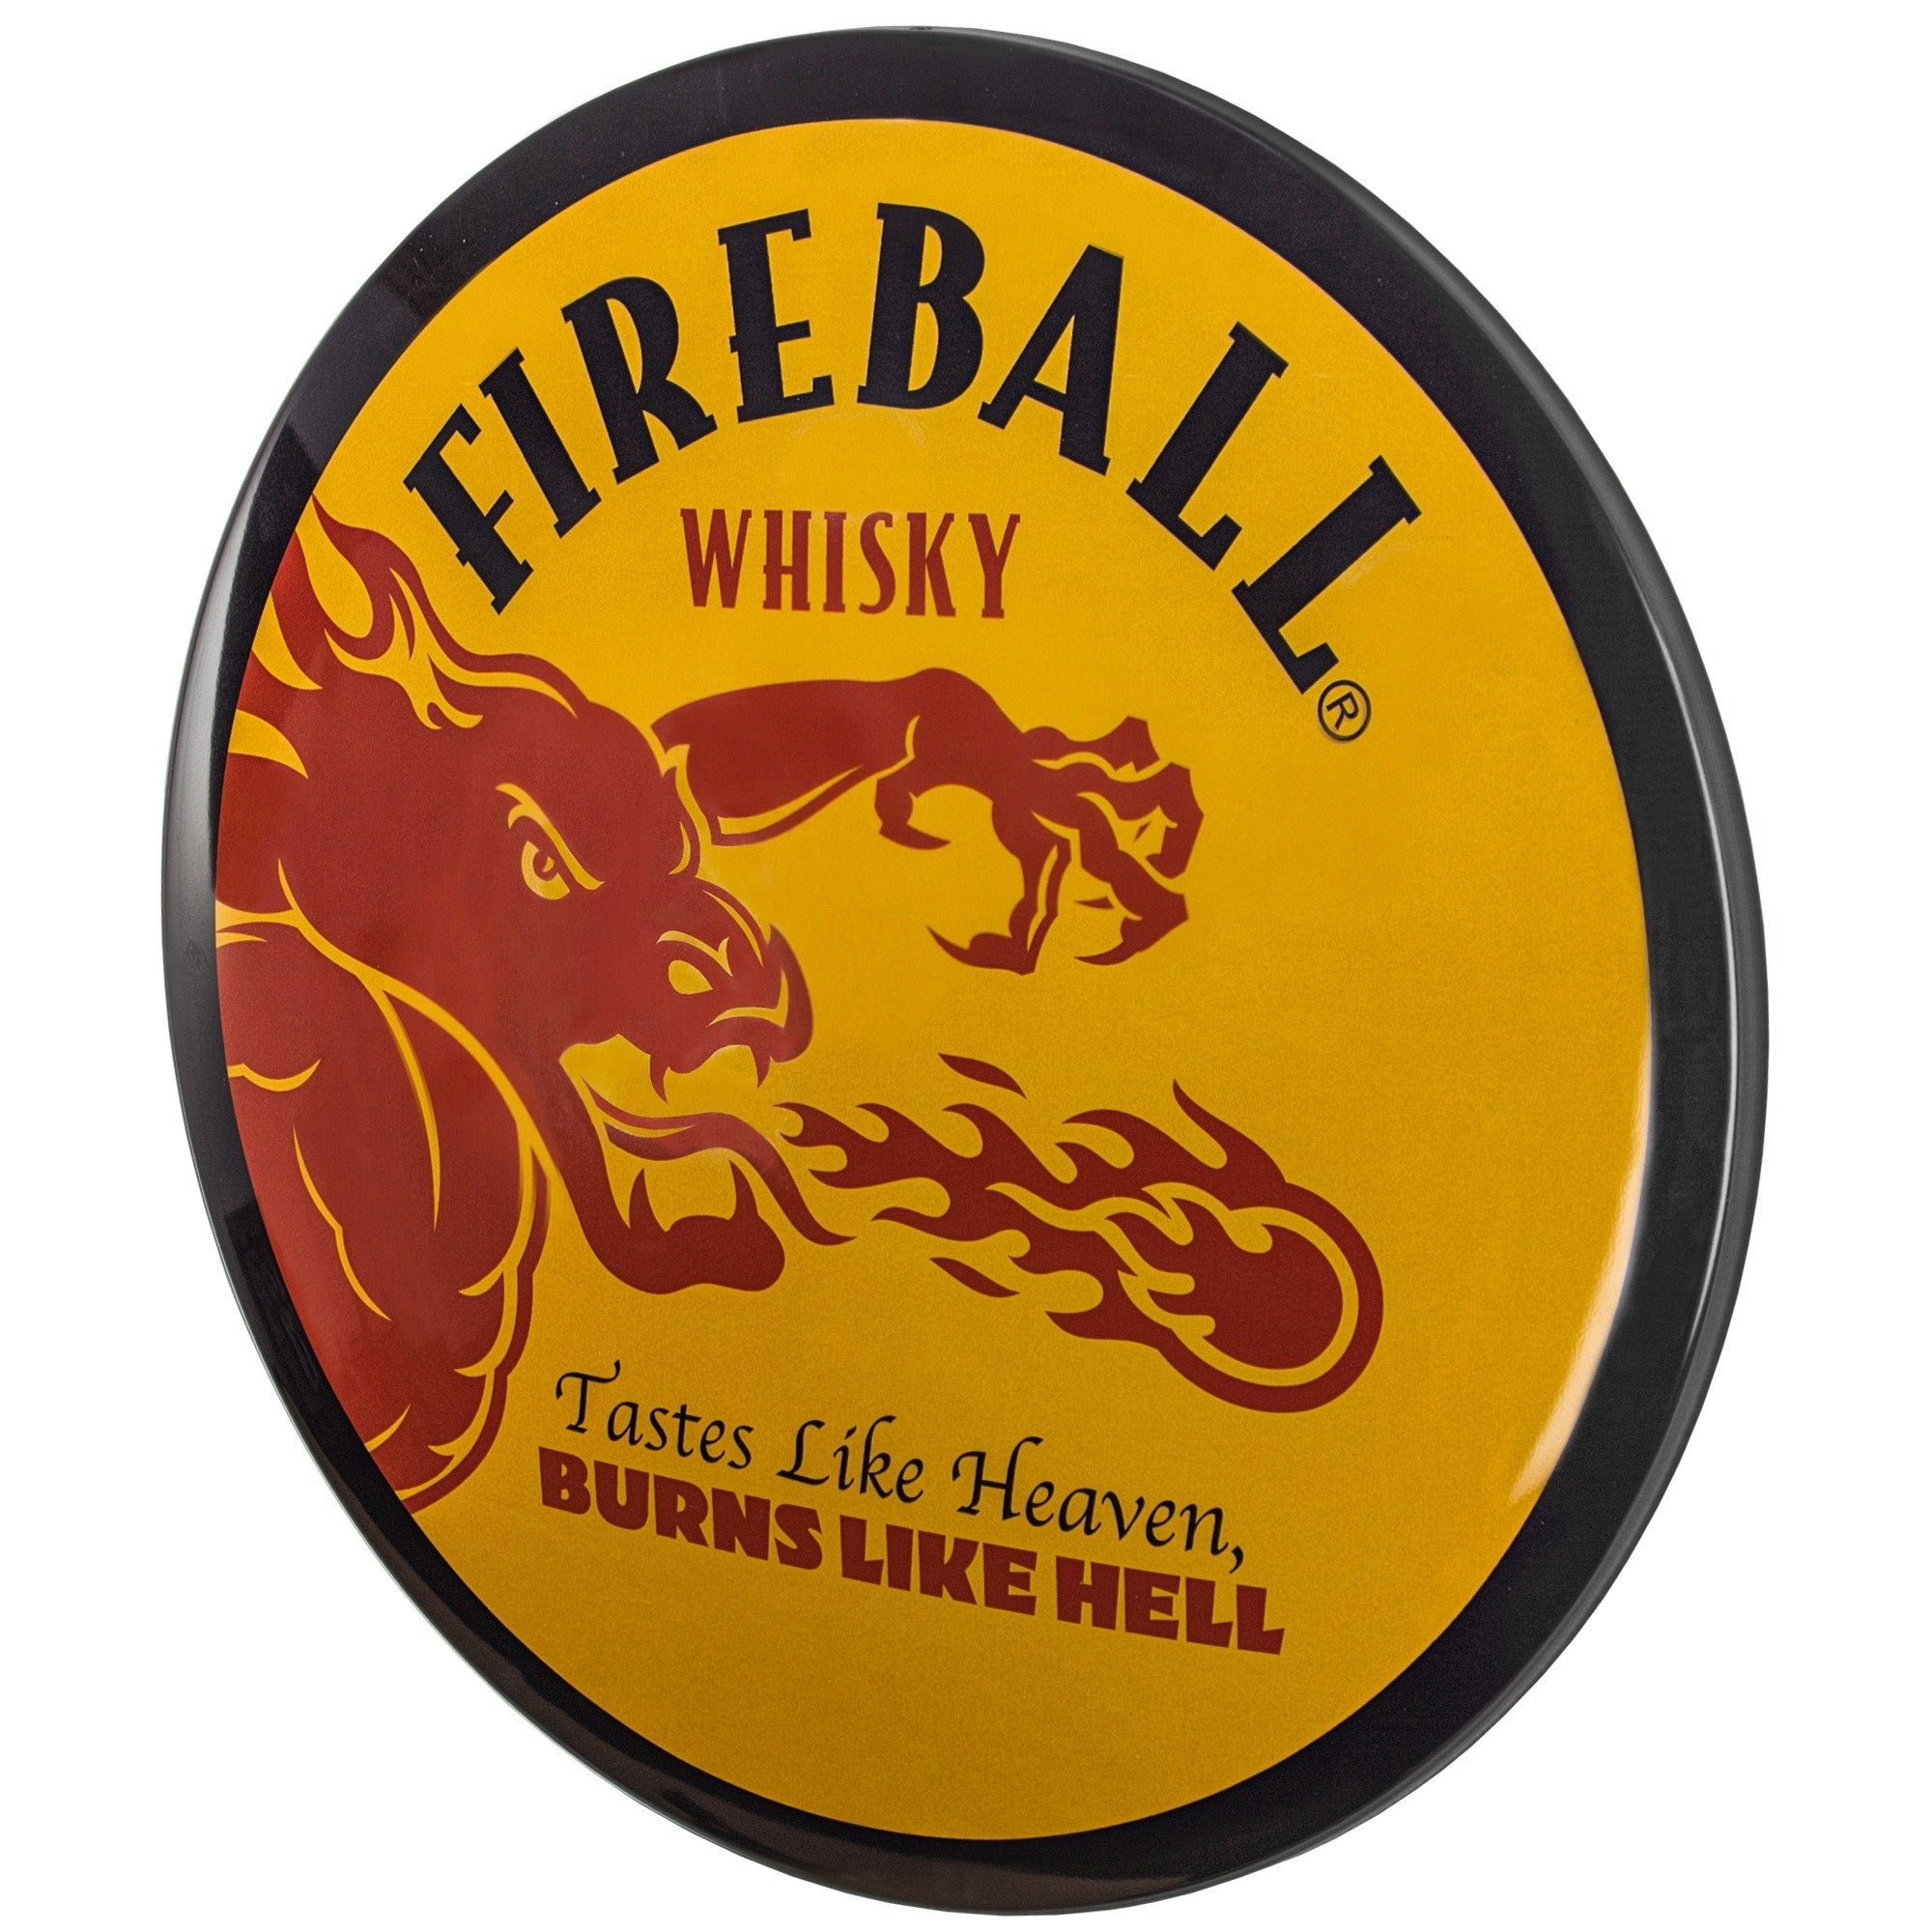 "Tastes Like Heaven Burns Like Hell Fireball Whisky 36/"" Double Sided LED Sign"